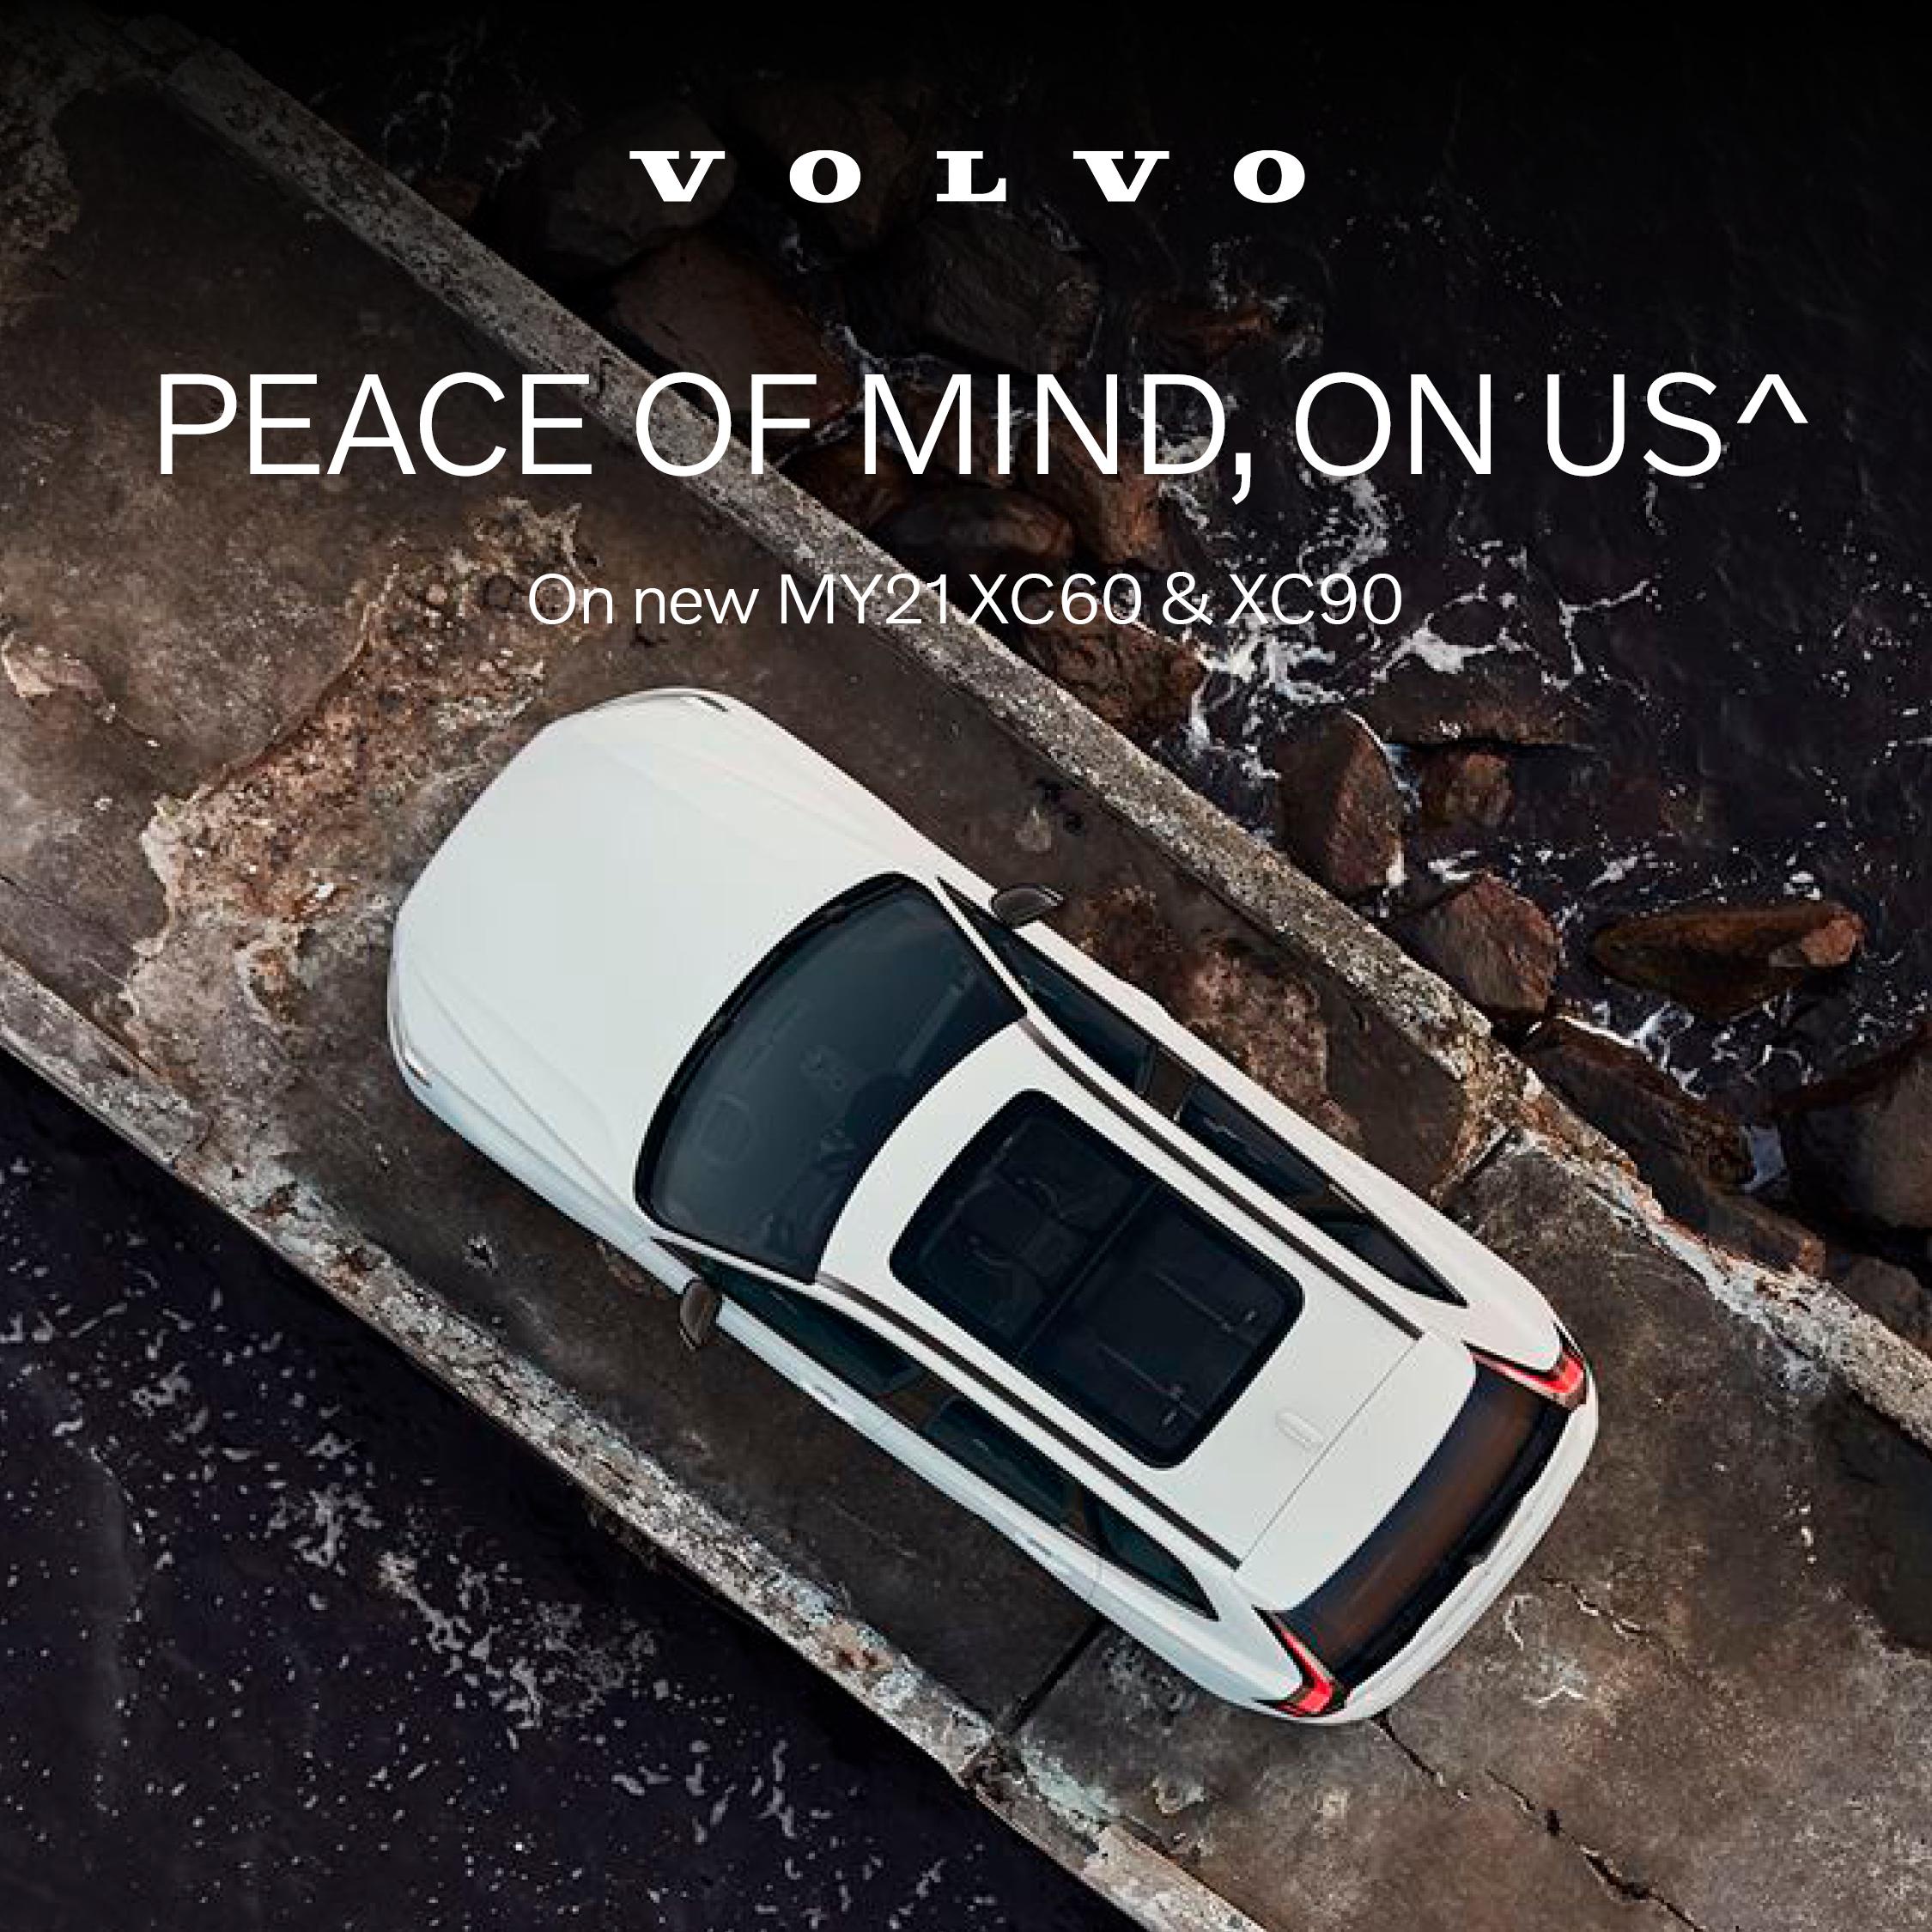 Peace of Mind, On Us on new MY21 XC60 & XC90